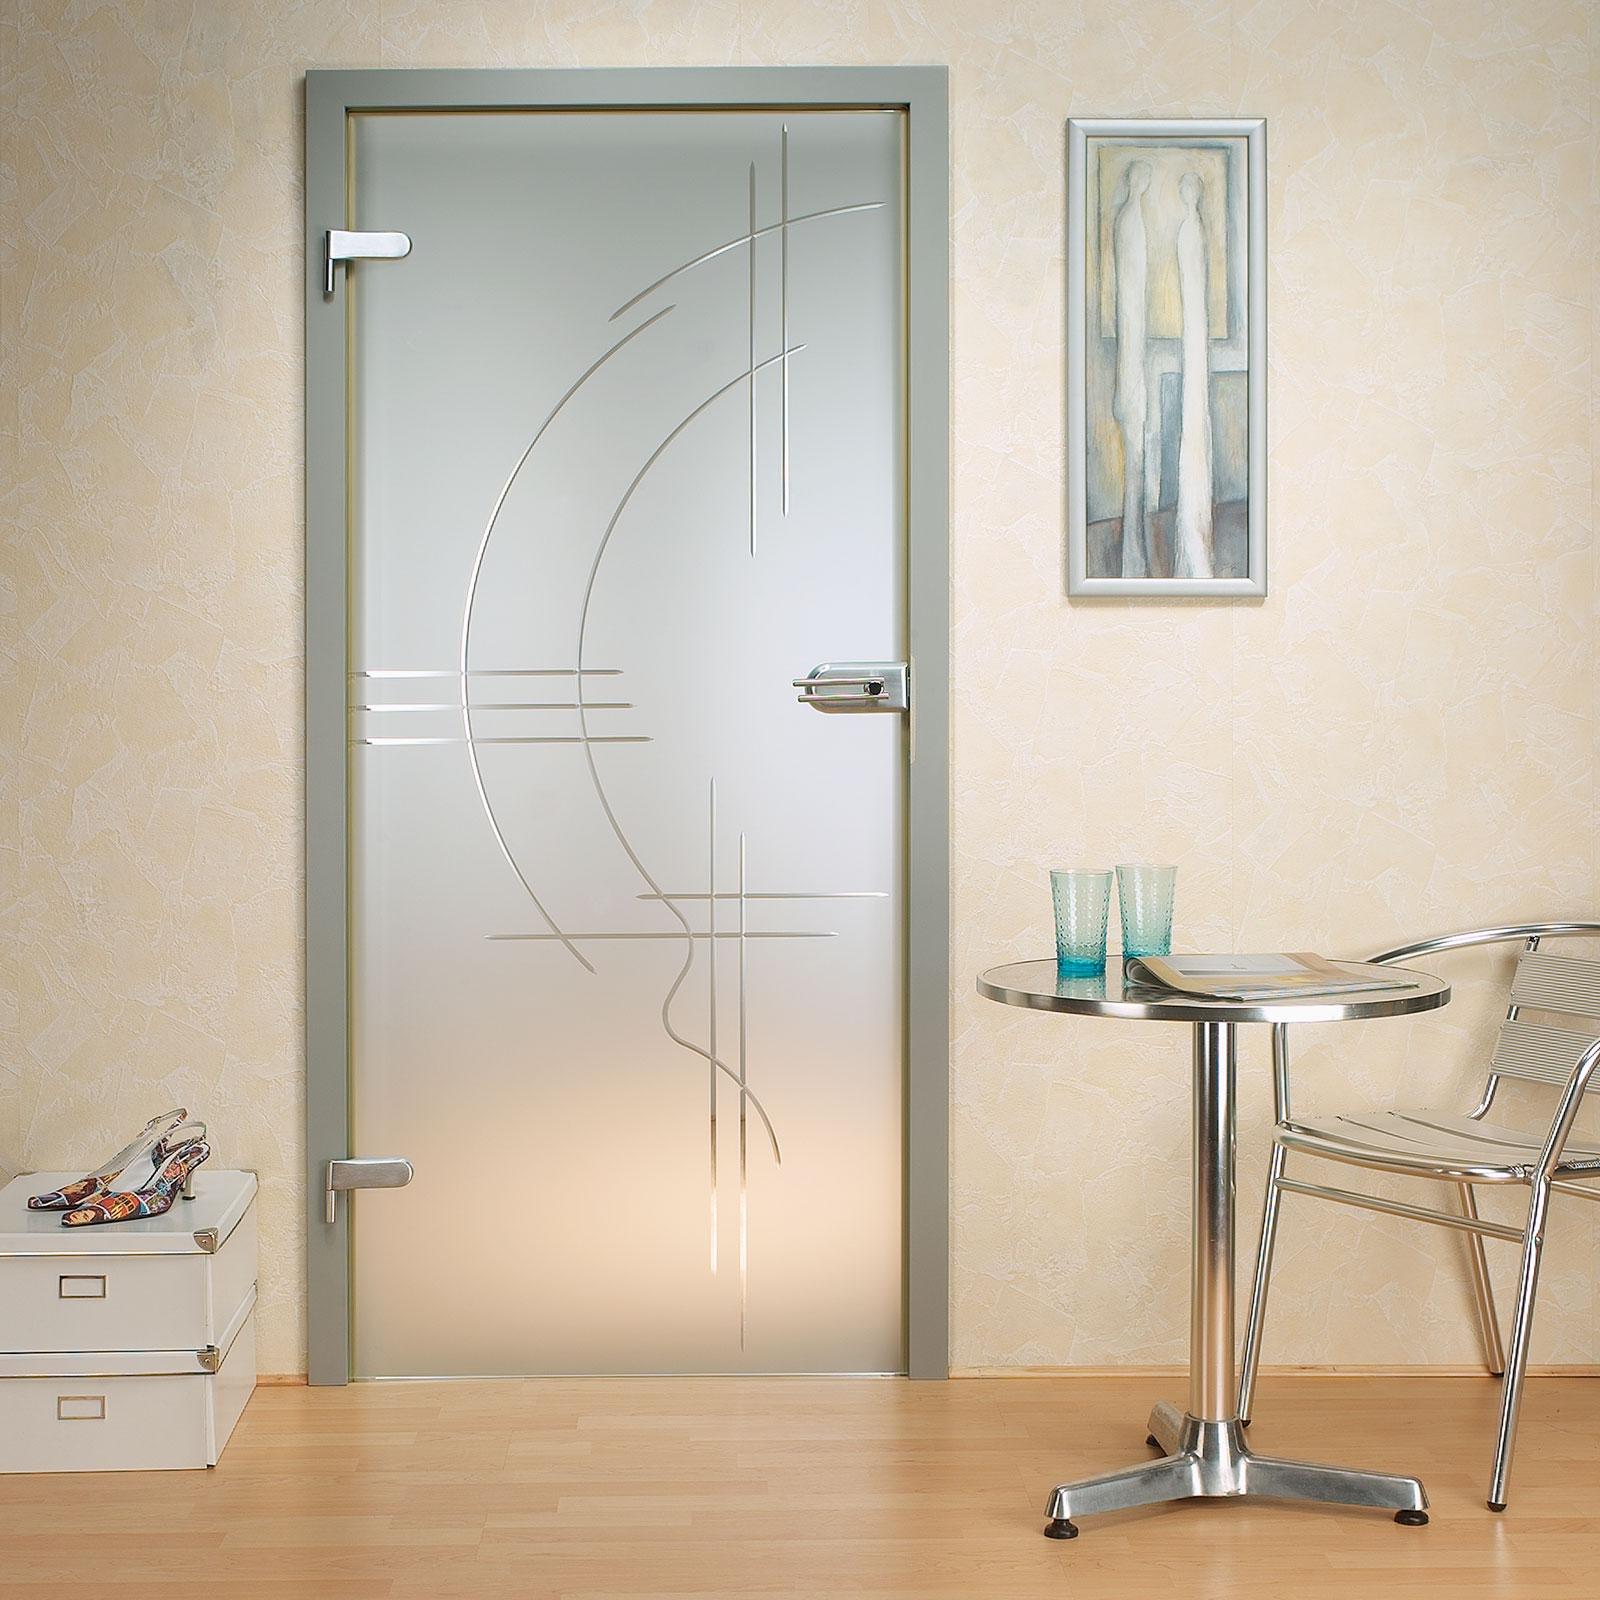 glast r gdr866 s1 satinato mit kristallrillenschliff ebay. Black Bedroom Furniture Sets. Home Design Ideas